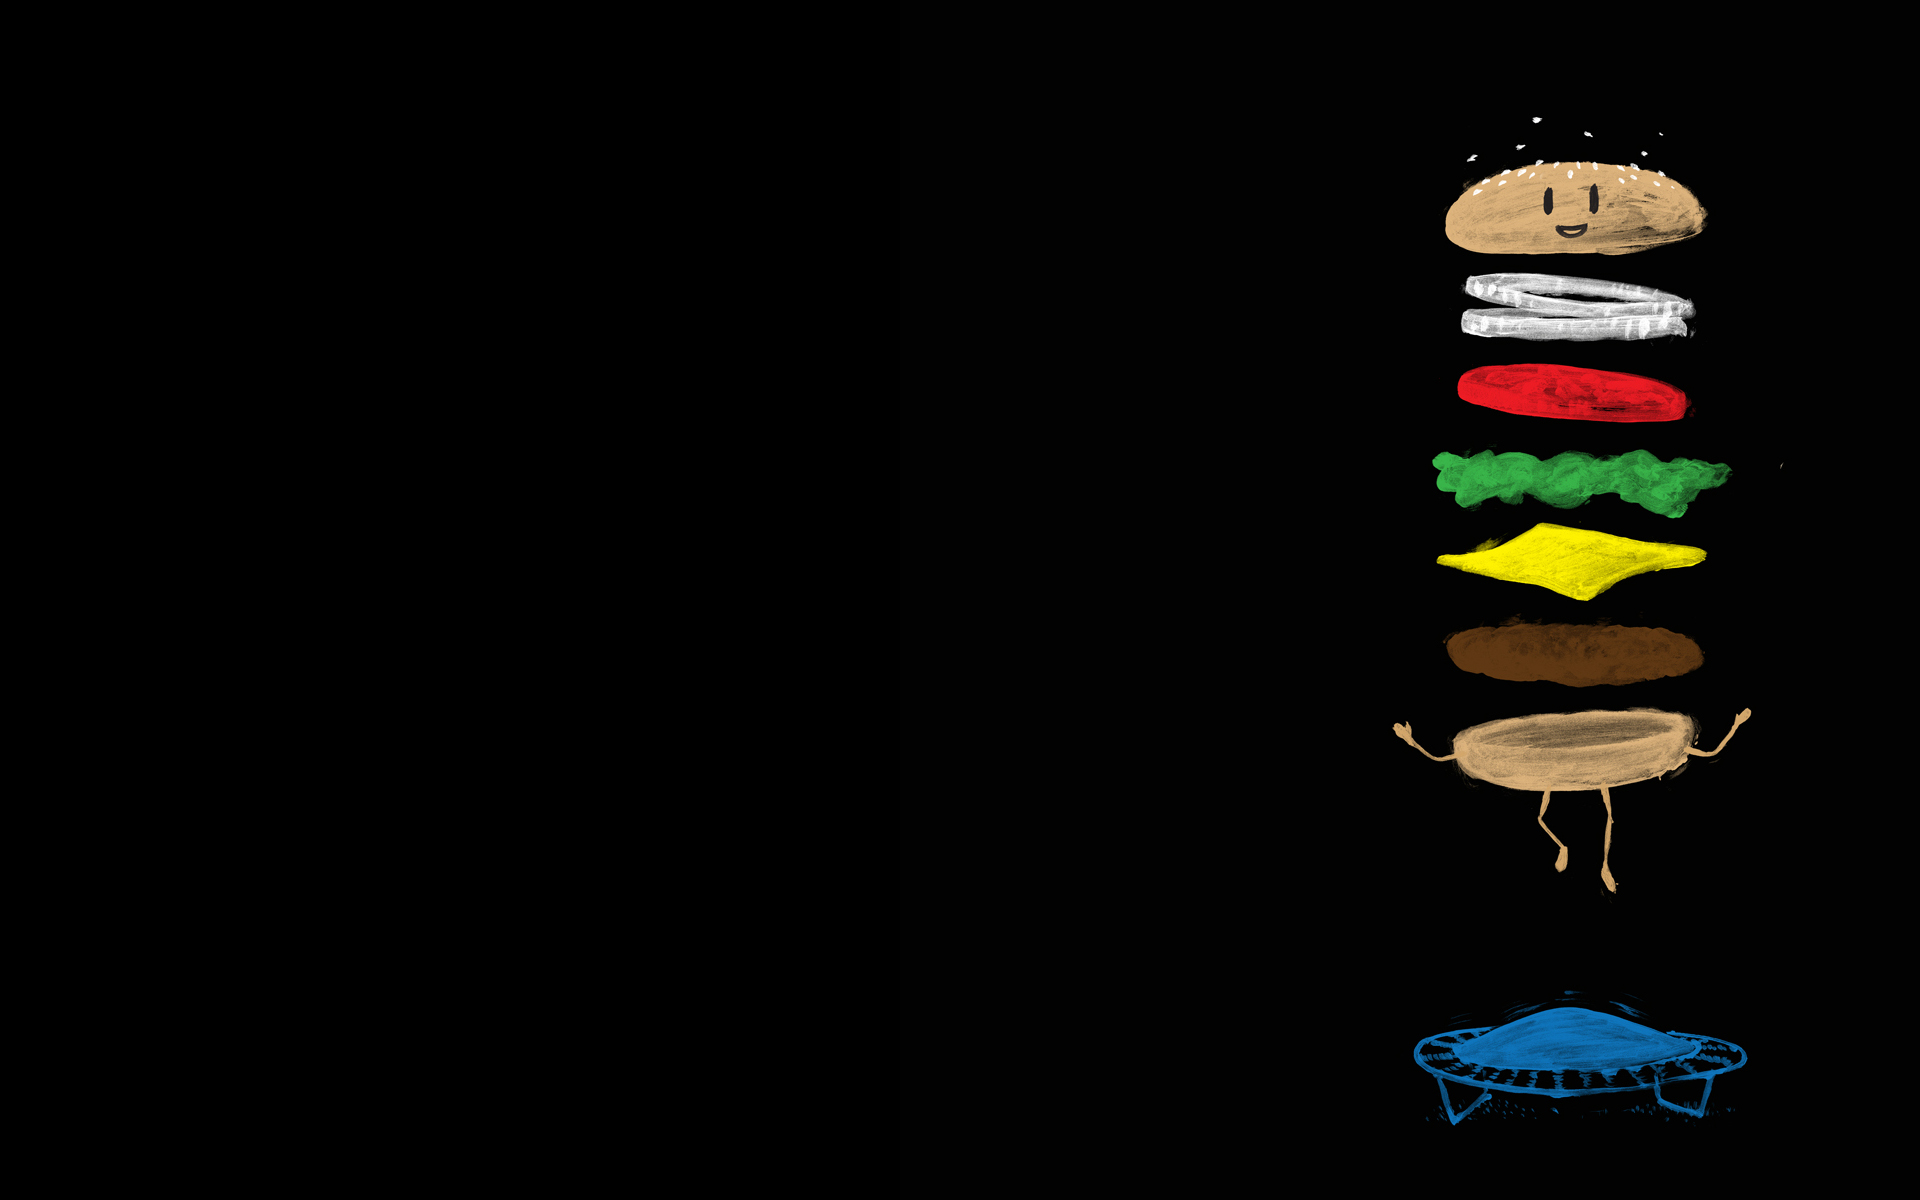 Jumping Hamburger PPT Backgrounds